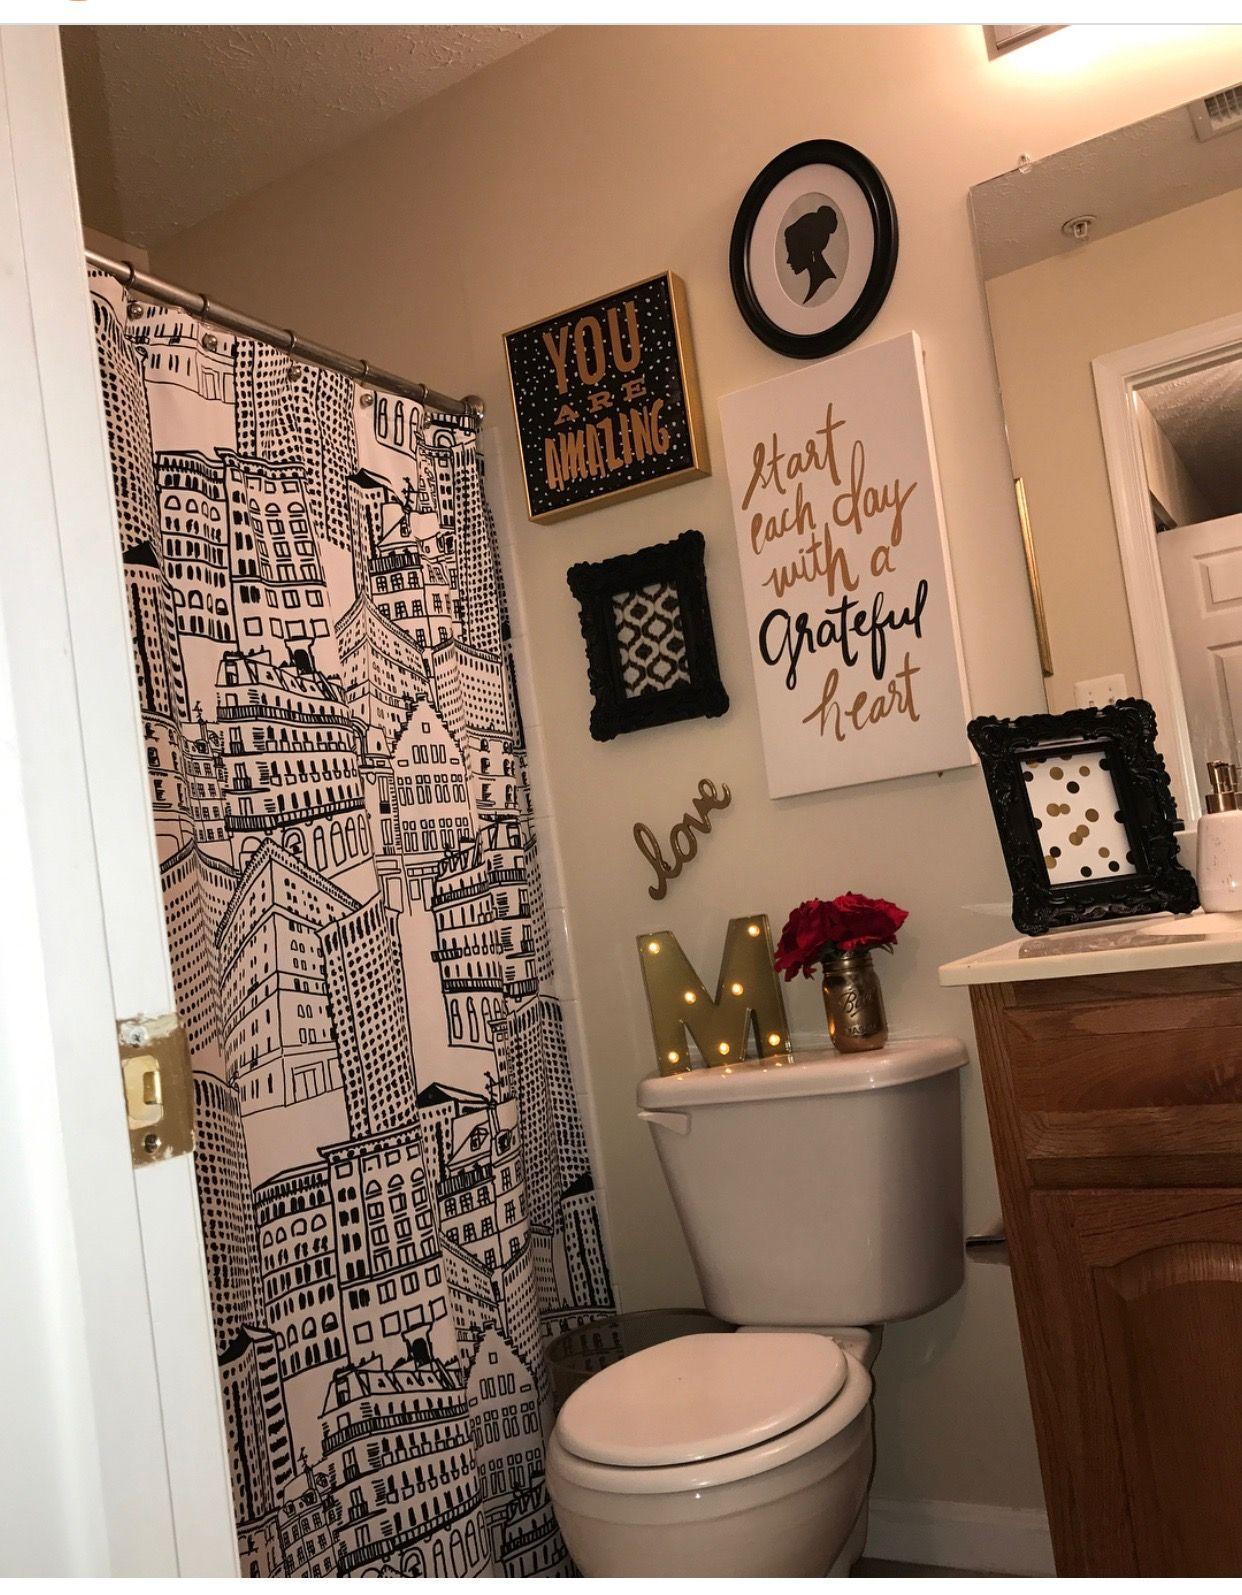 Young Ladies Bathroom Ladies Bathroom Bathroom Decor Bathroom Ideas to decorate bathrooms